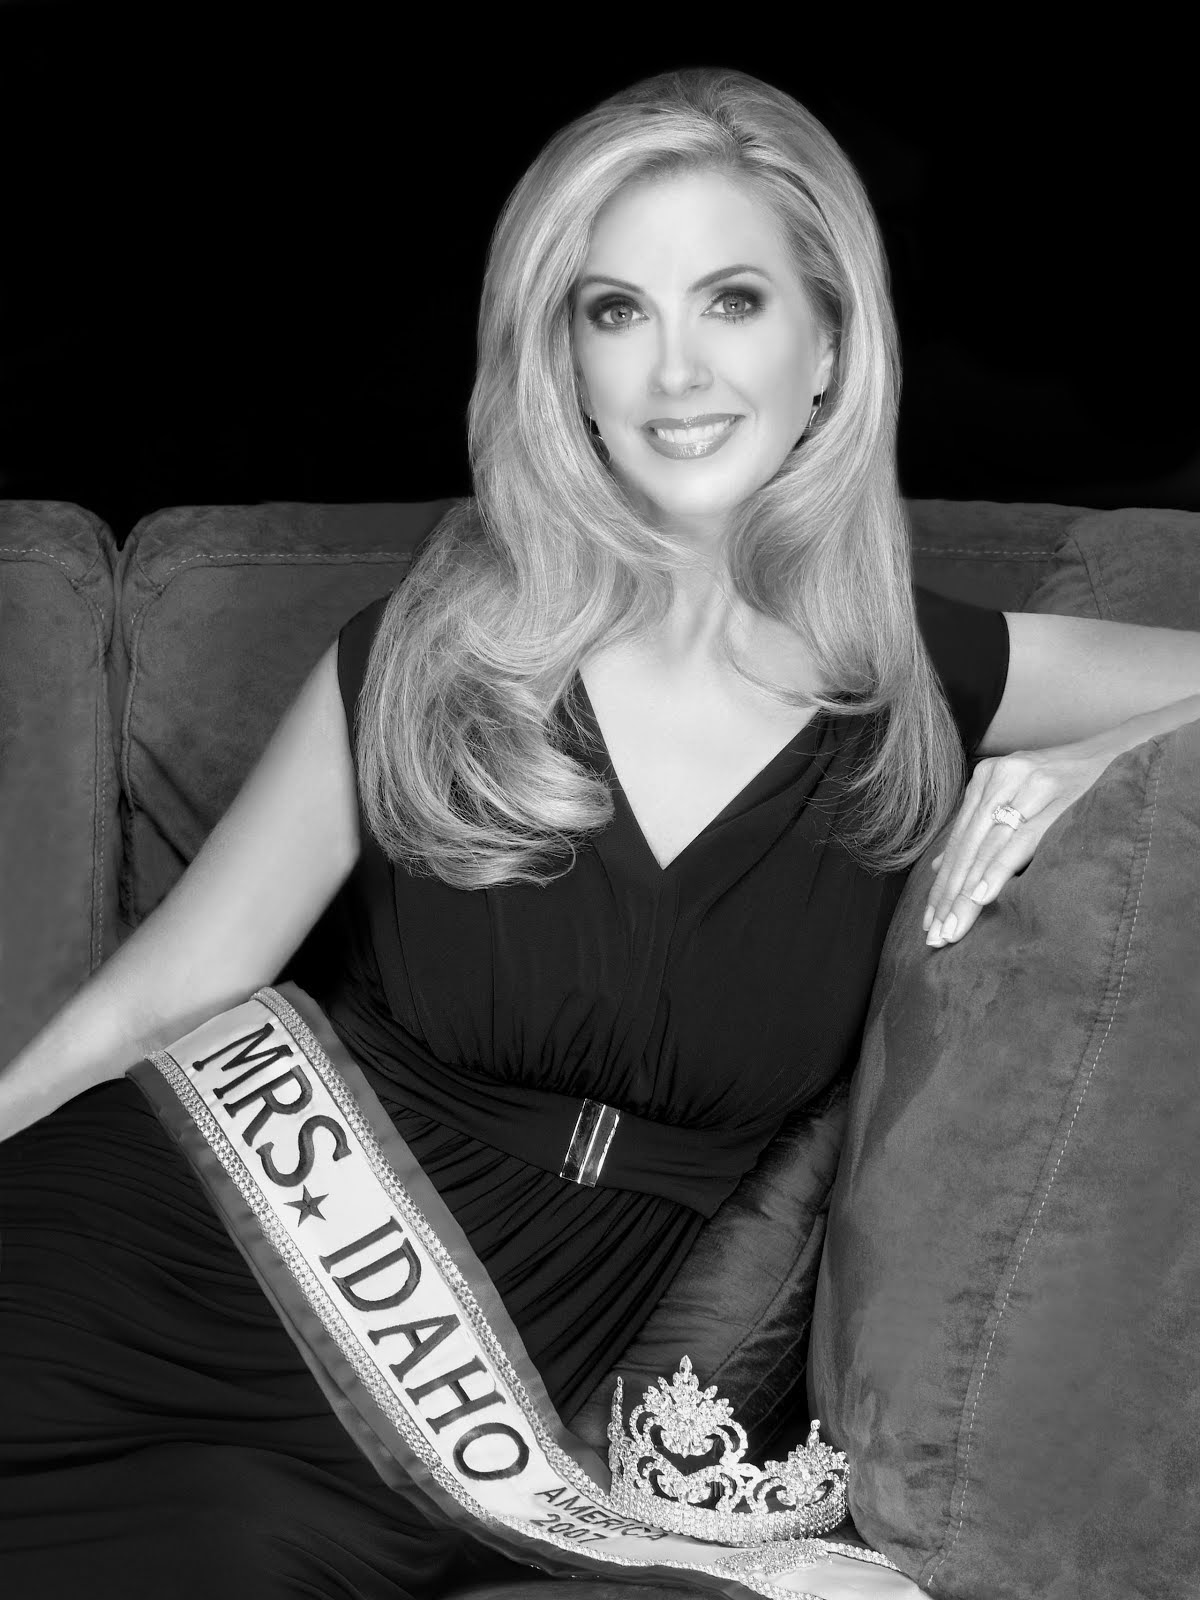 Mrs. Idaho America